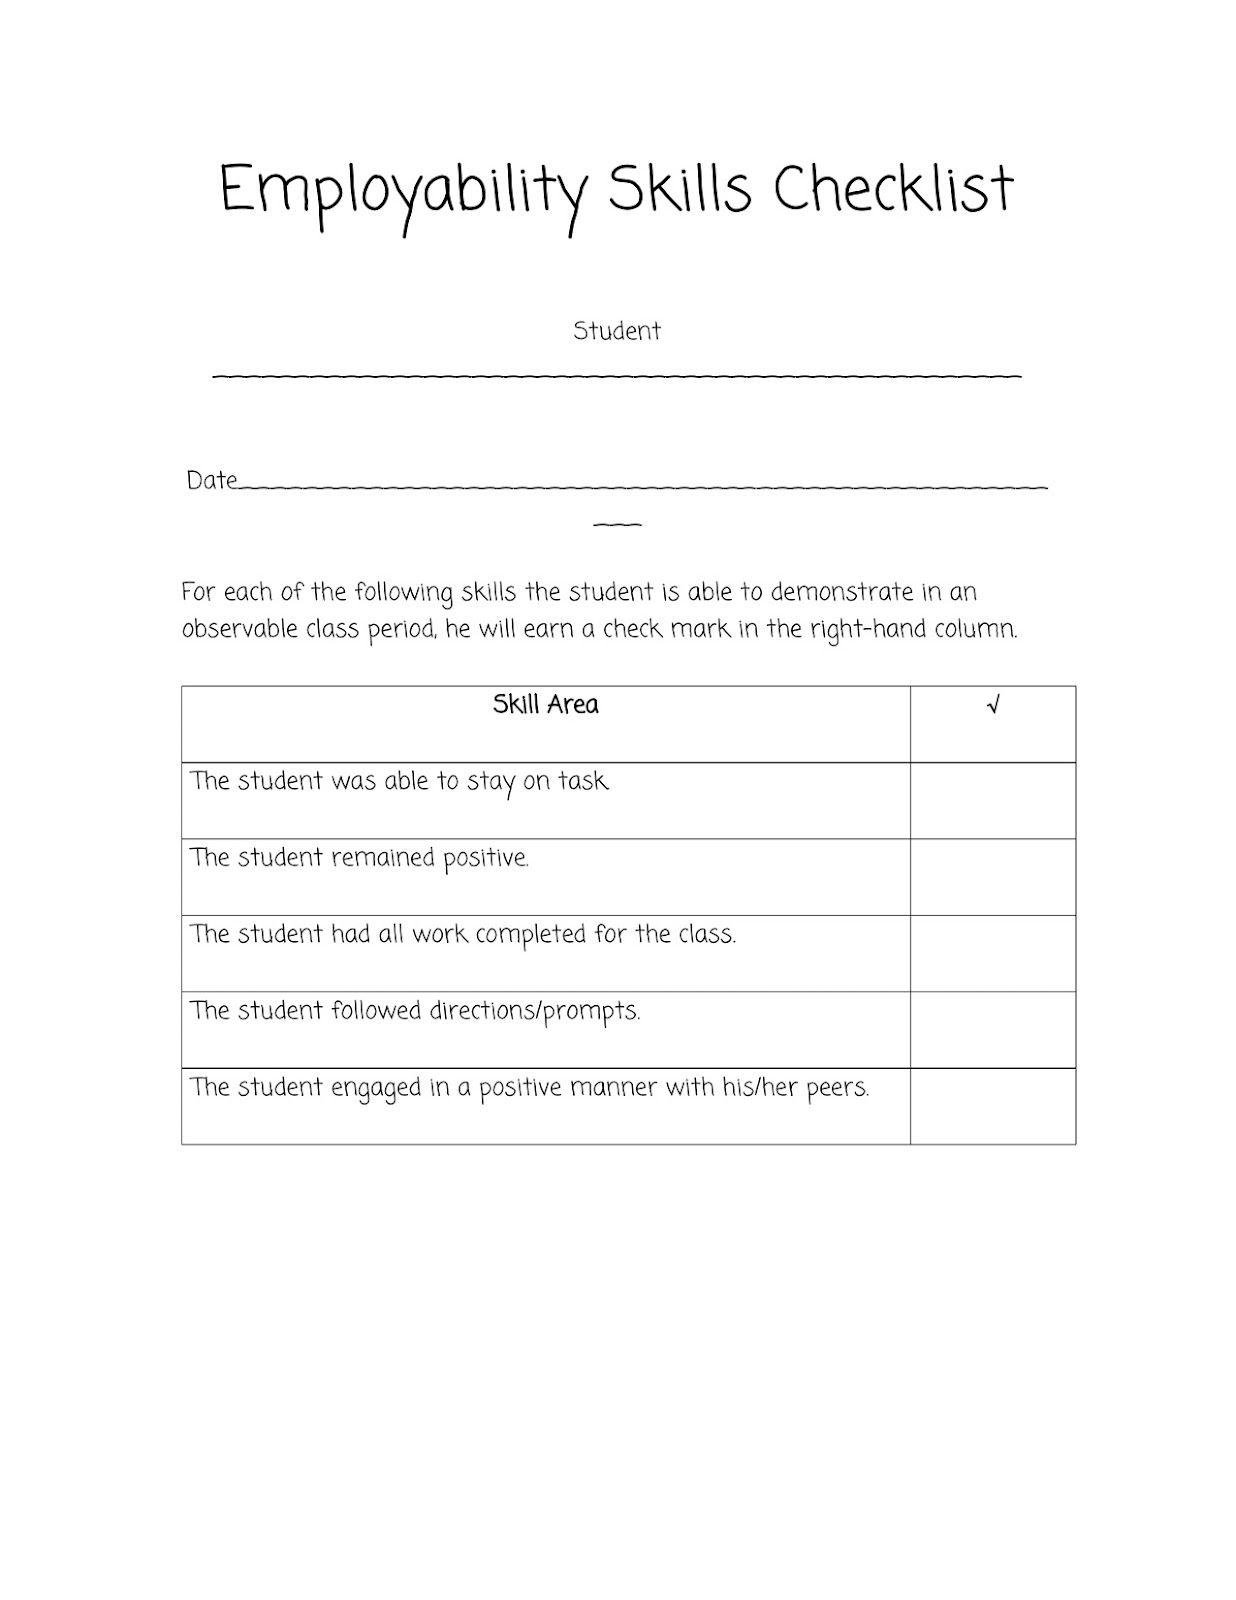 Worksheets Employability Skills Worksheets sped head employability skills checklist behavior social and checklist